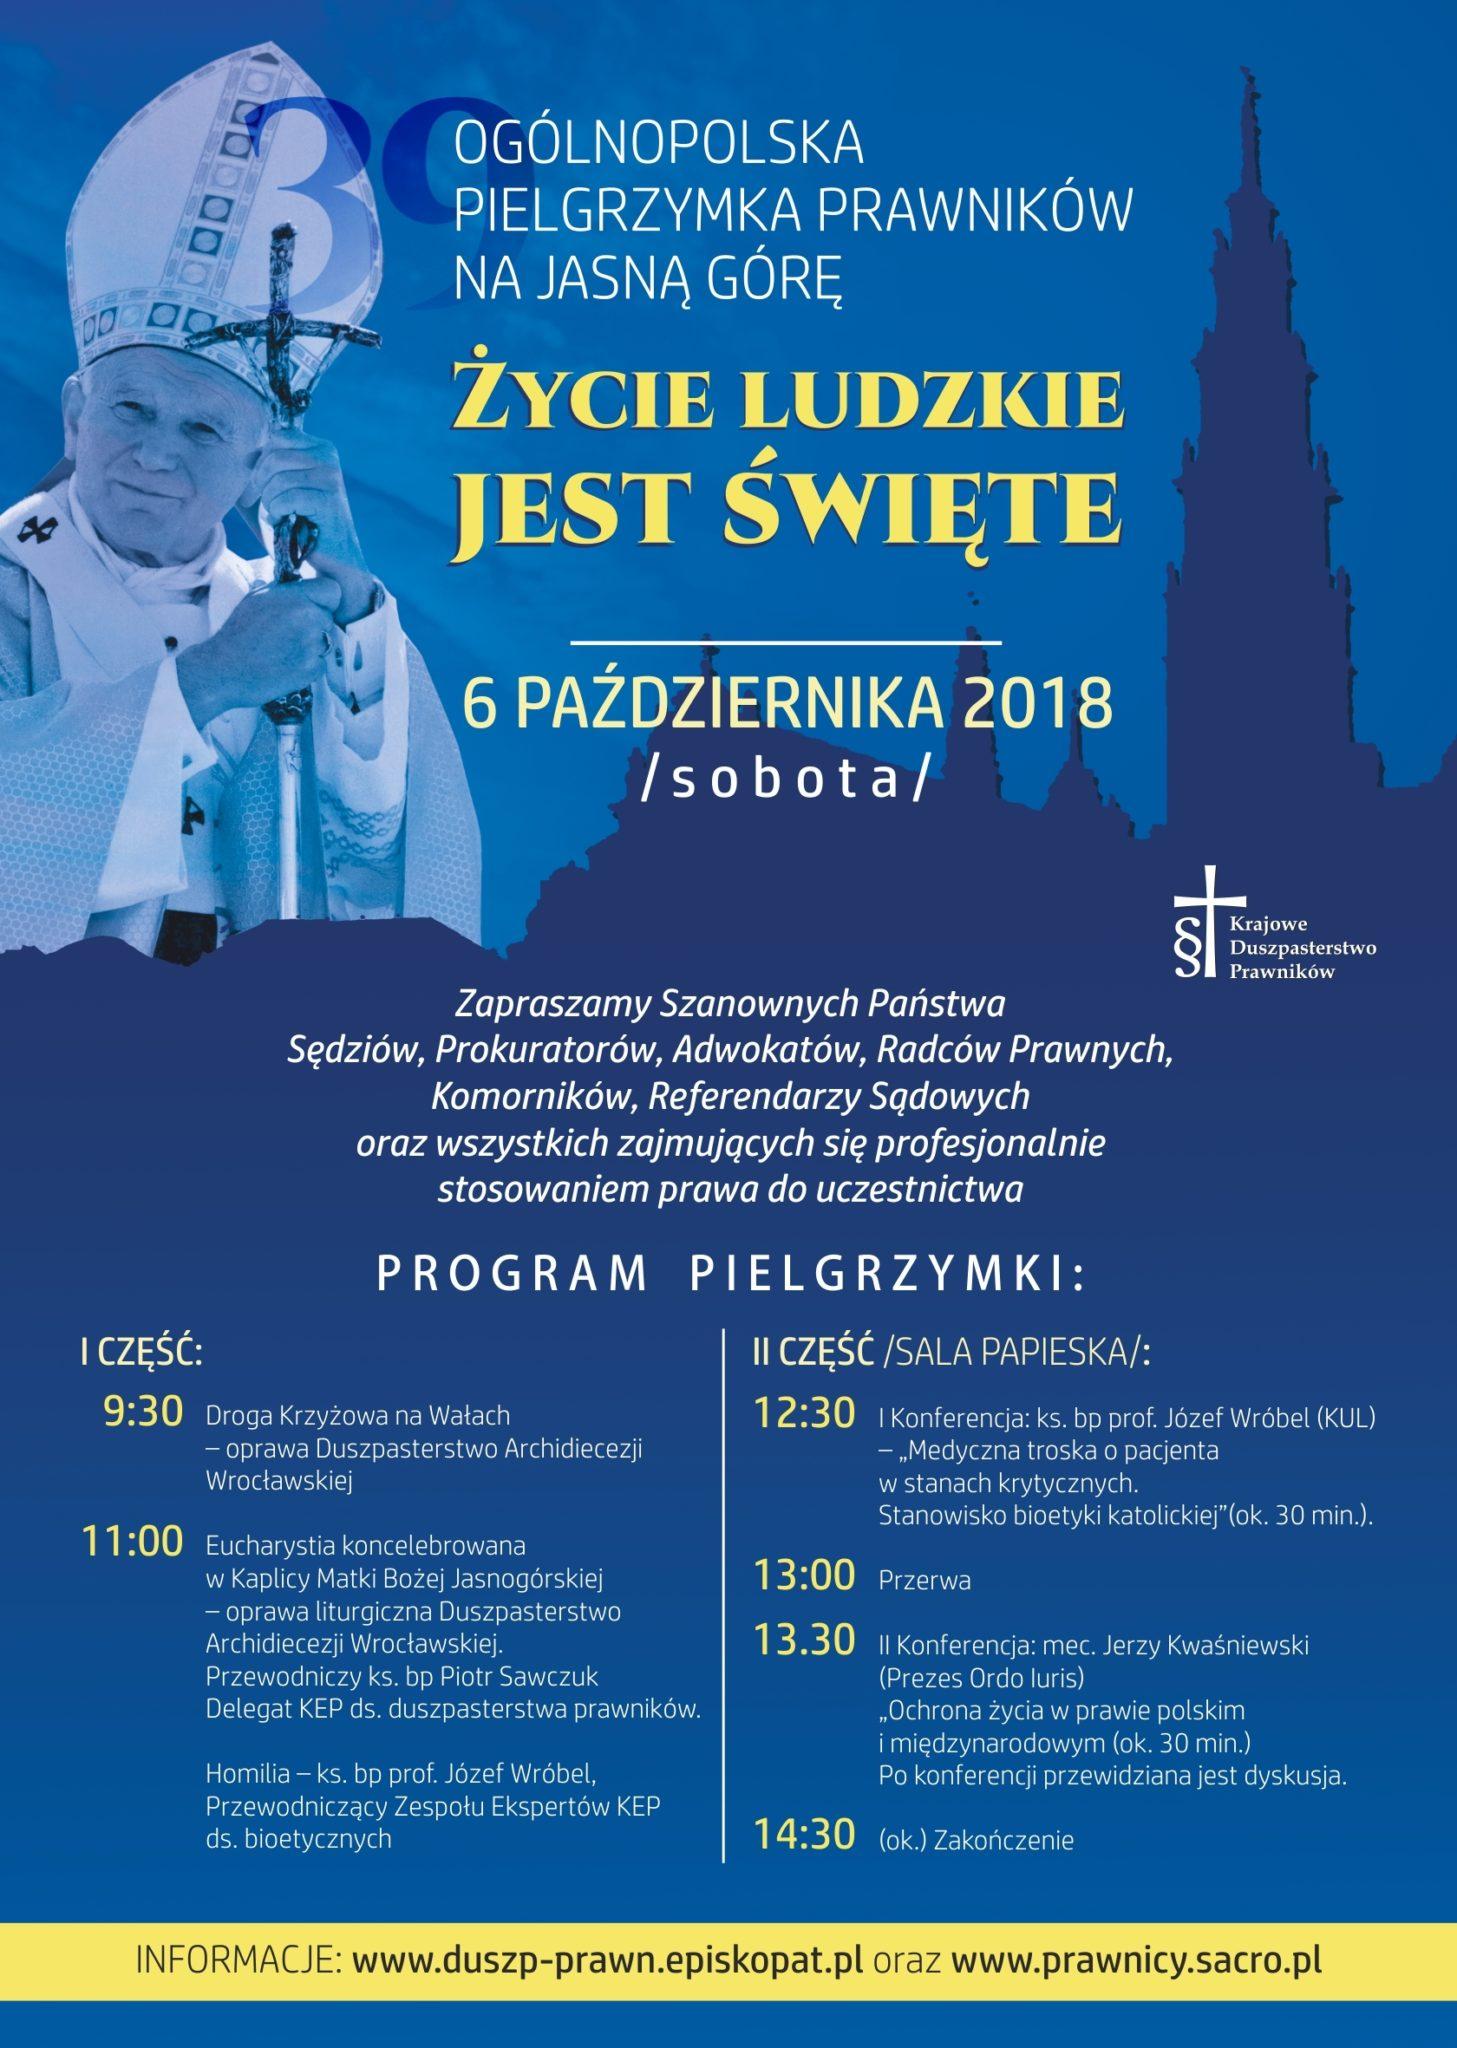 http://lodz.adwokatura.pl/wp-content/uploads/2019/04/file-fetch-uid-3858.jpg